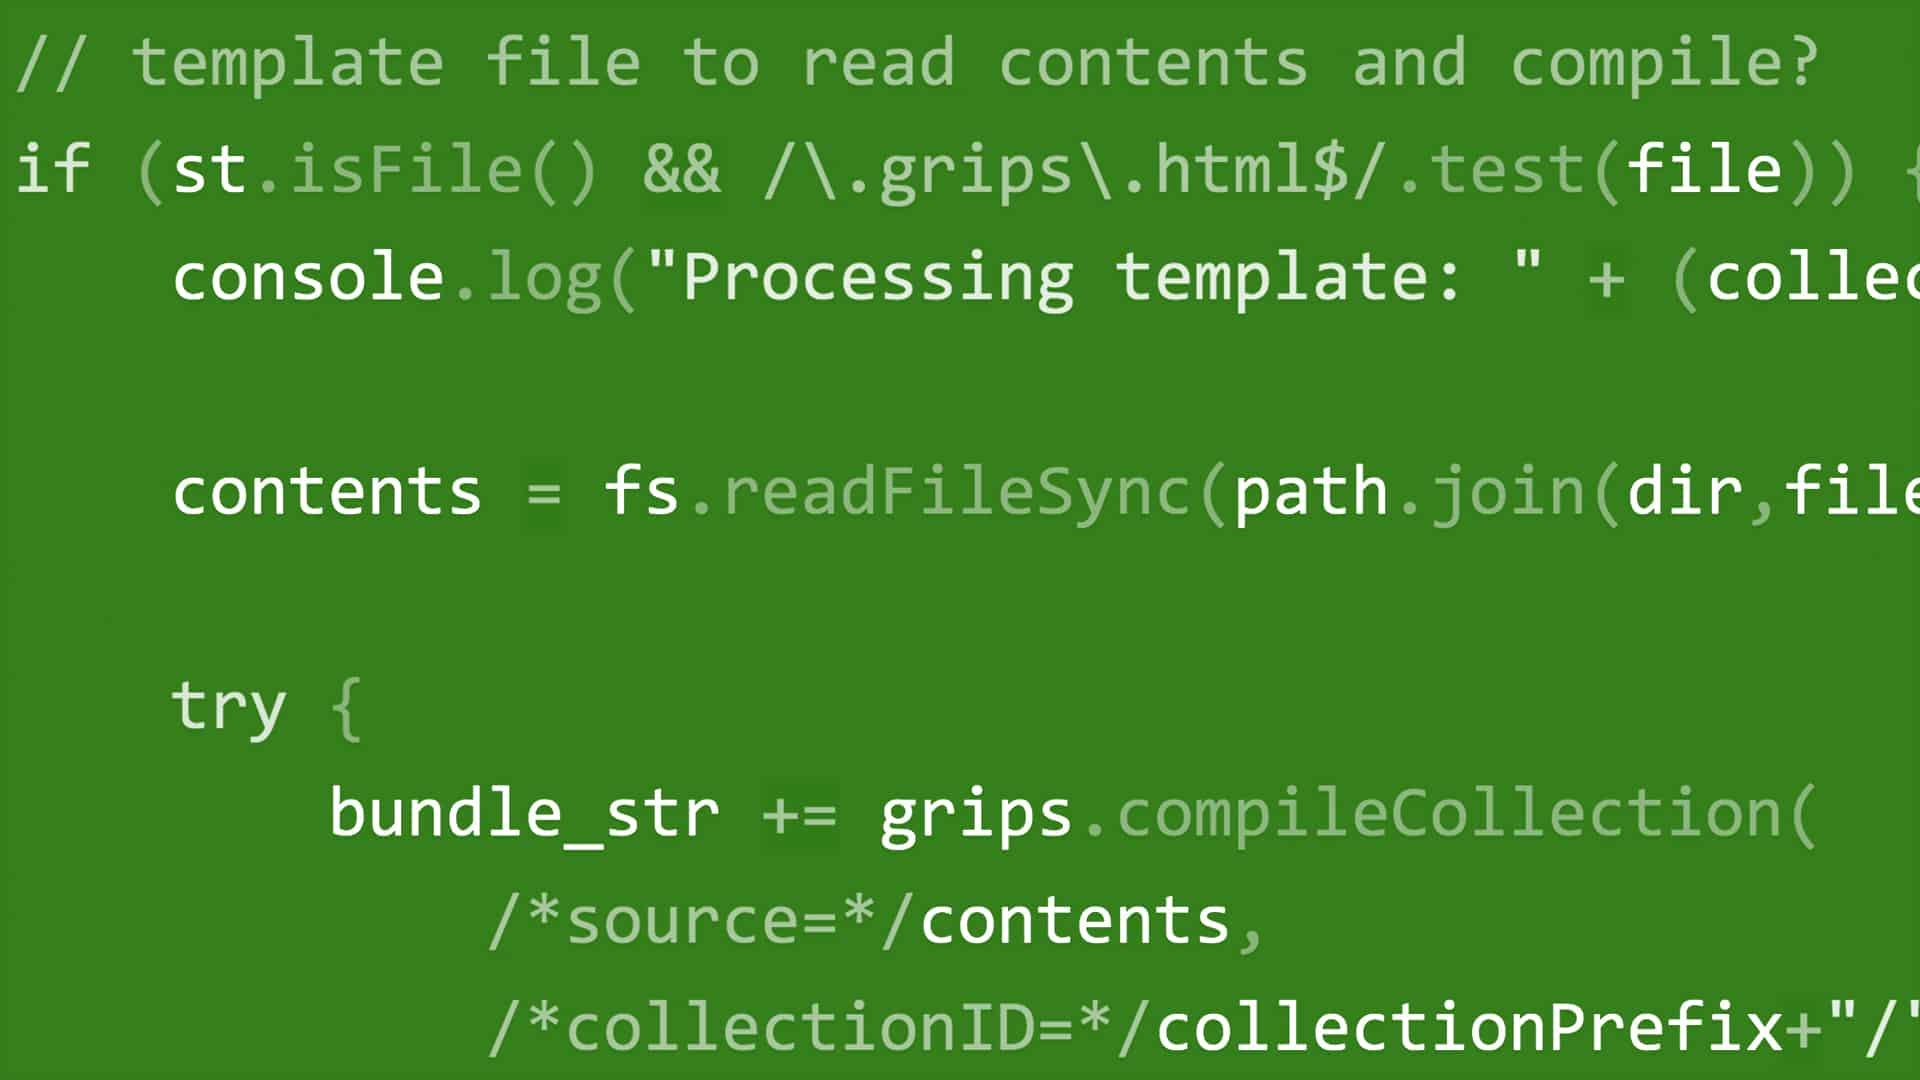 [Lynda] Organizing JavaScript Functionality